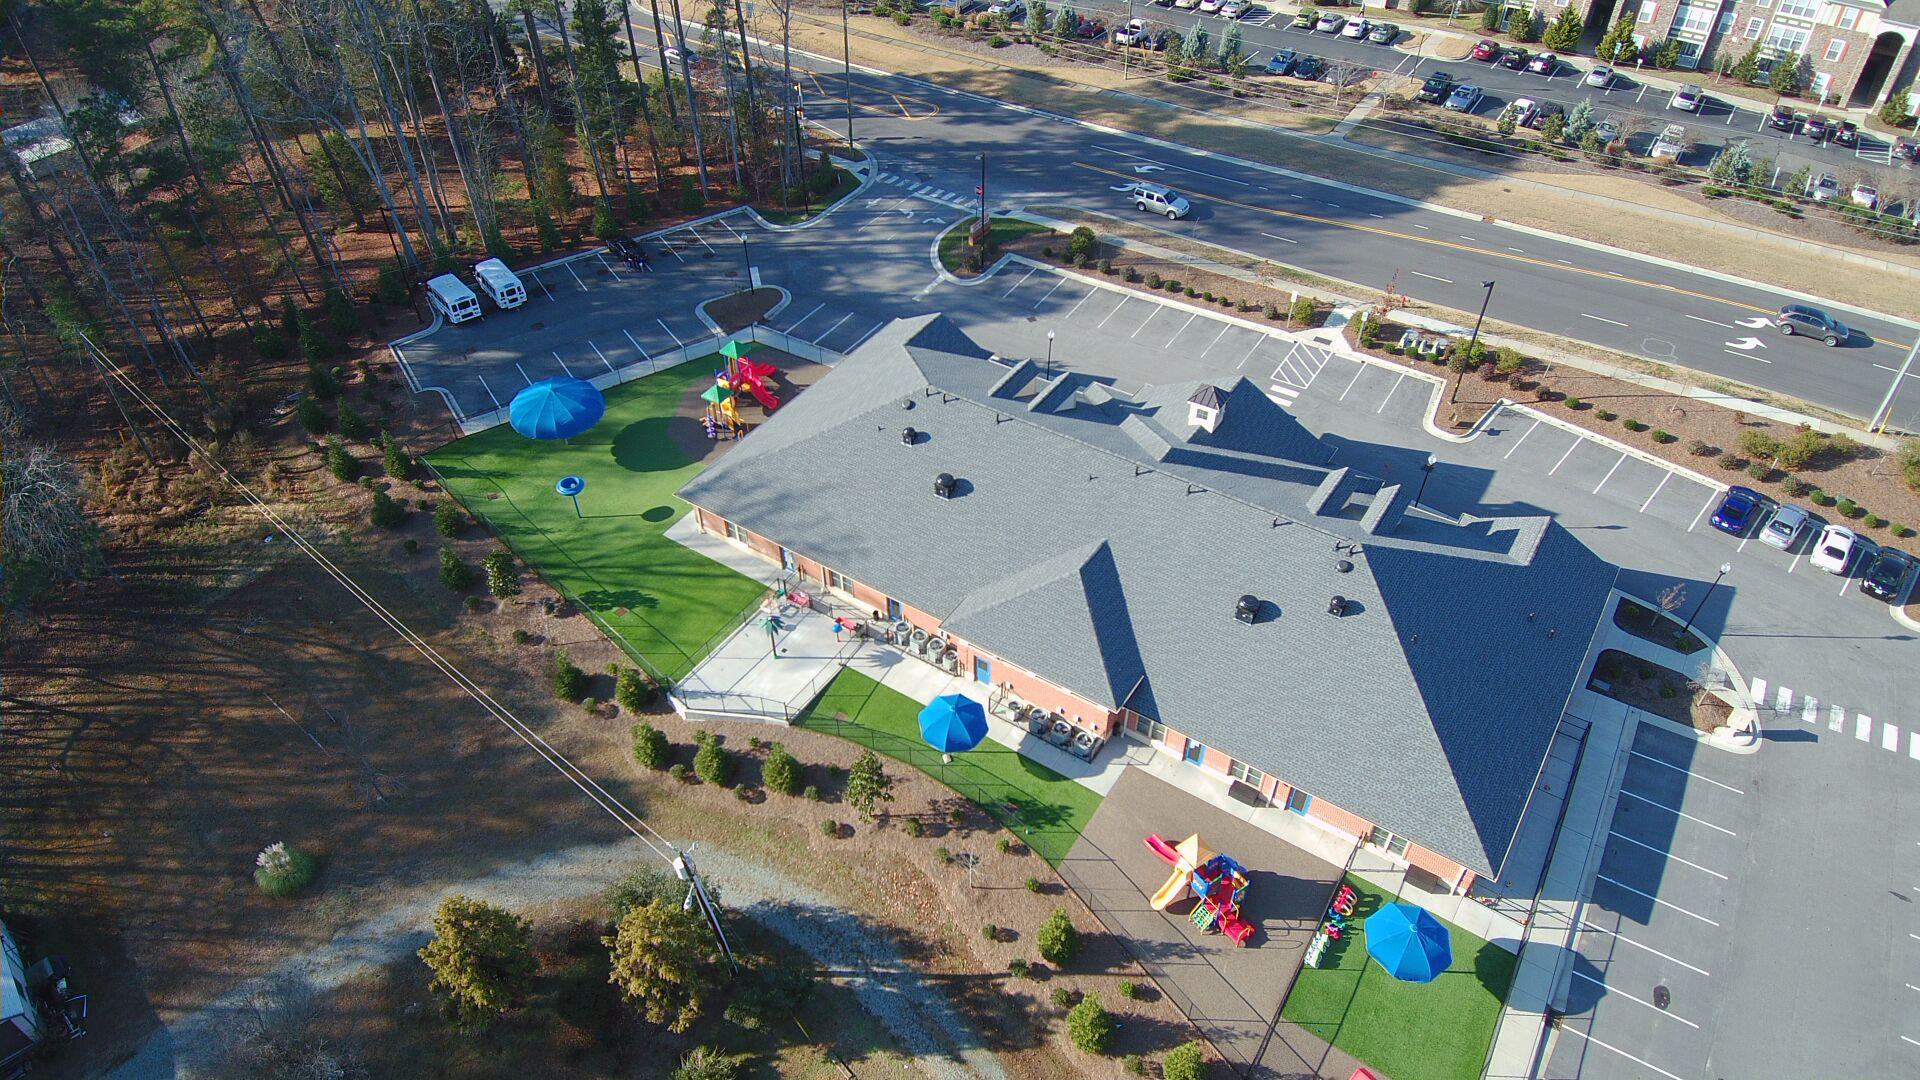 Olive Chapel West underground detention and landscape design